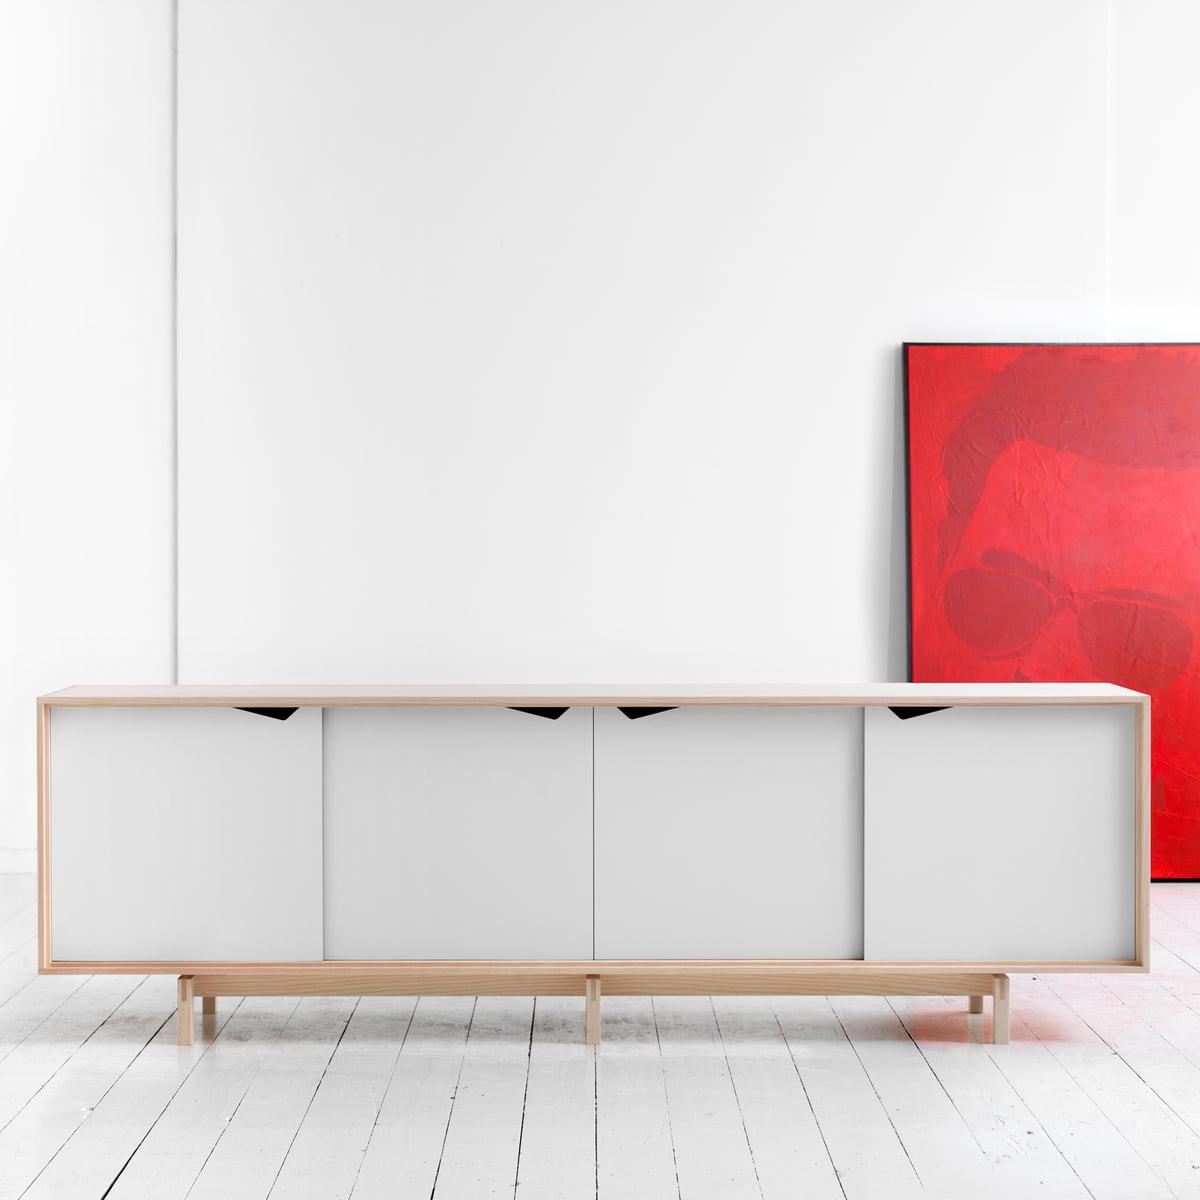 weies sideboard cheap finn juhl diplomat series sideboard in rosewood with aluminum handles. Black Bedroom Furniture Sets. Home Design Ideas